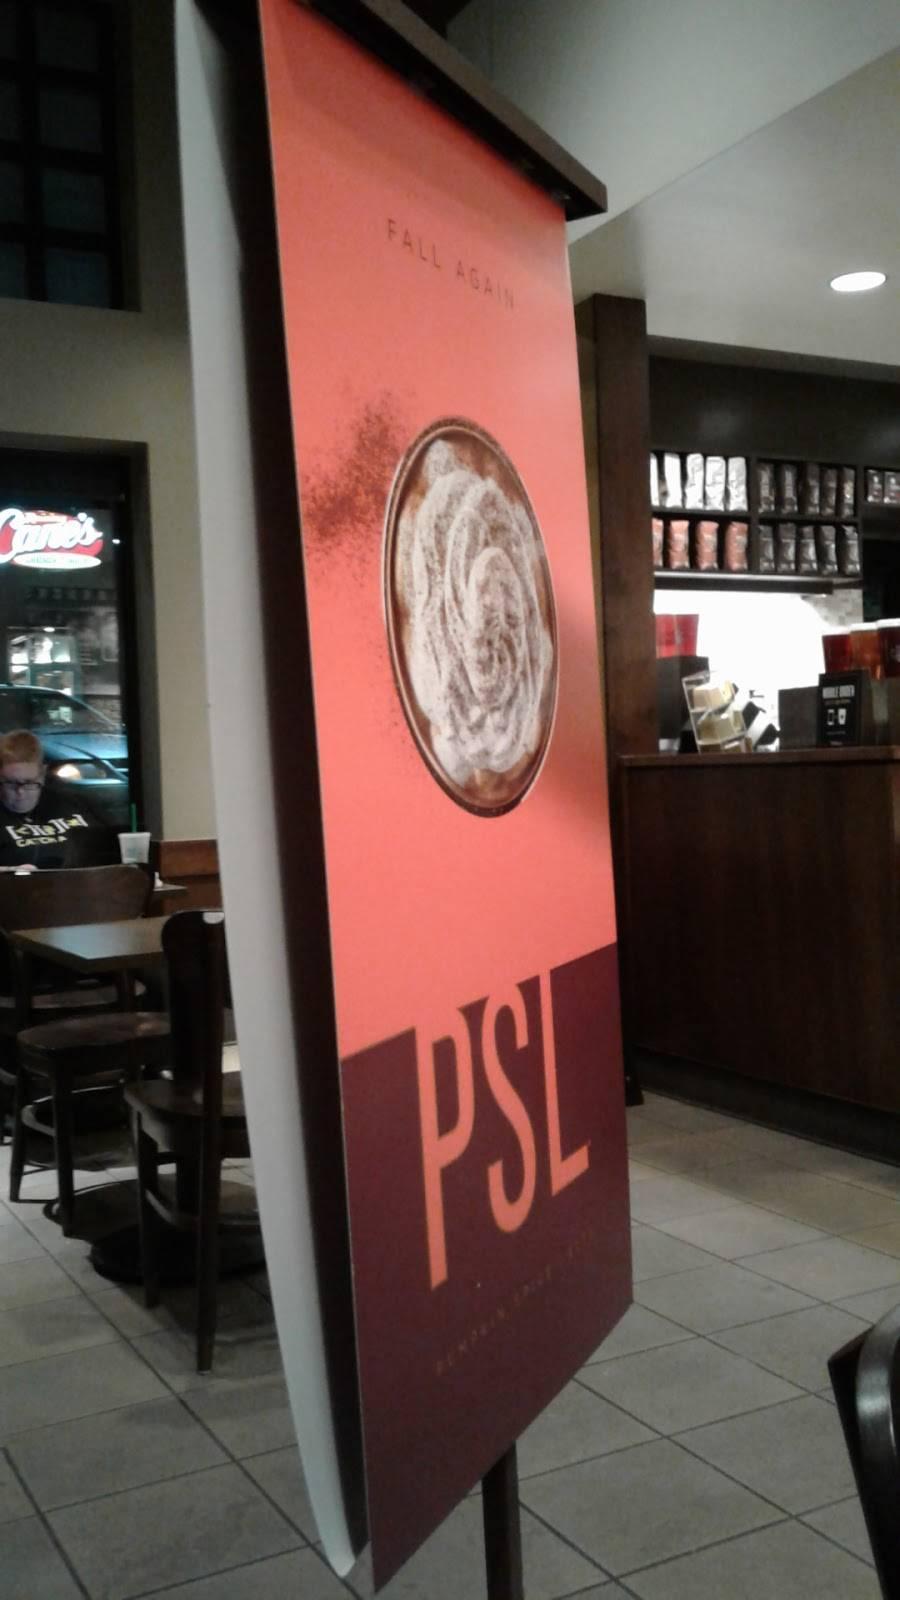 Starbucks - cafe    Photo 10 of 10   Address: 5731 S Hulen St, Fort Worth, TX 76132, USA   Phone: (817) 346-2715